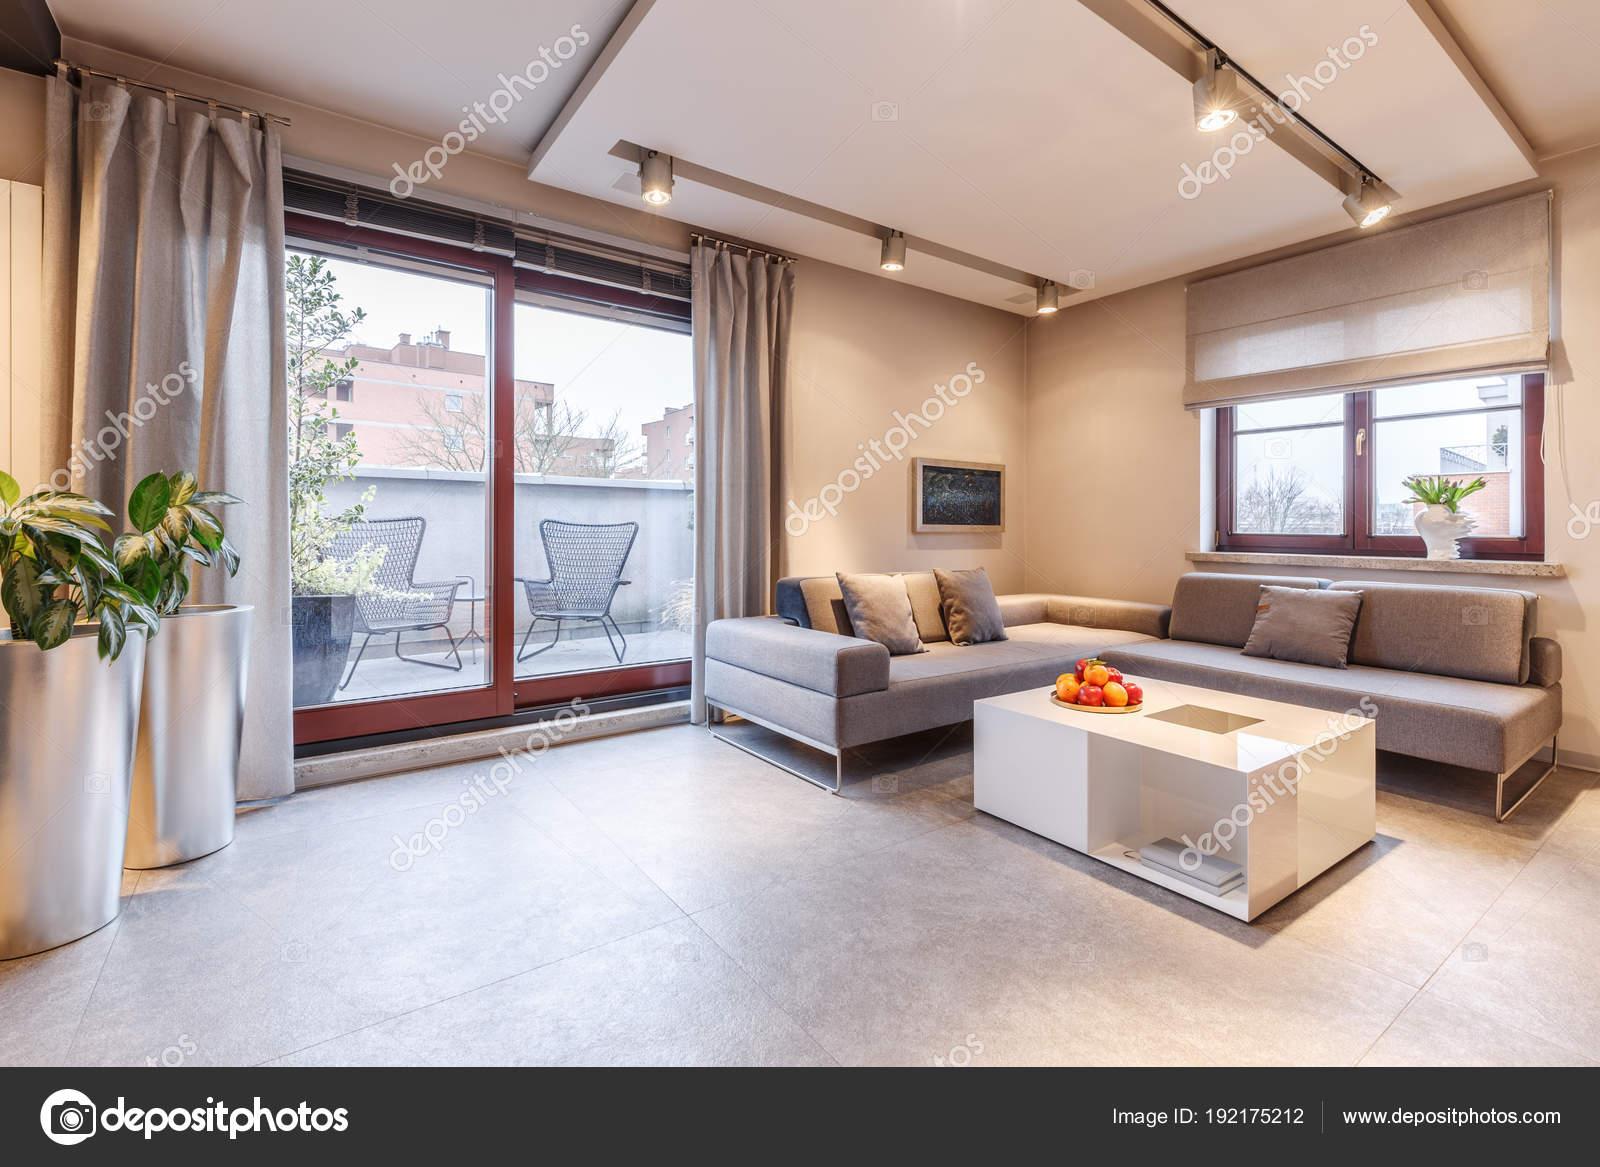 Bruin woonkamer interieur — Stockfoto © photographee.eu #192175212